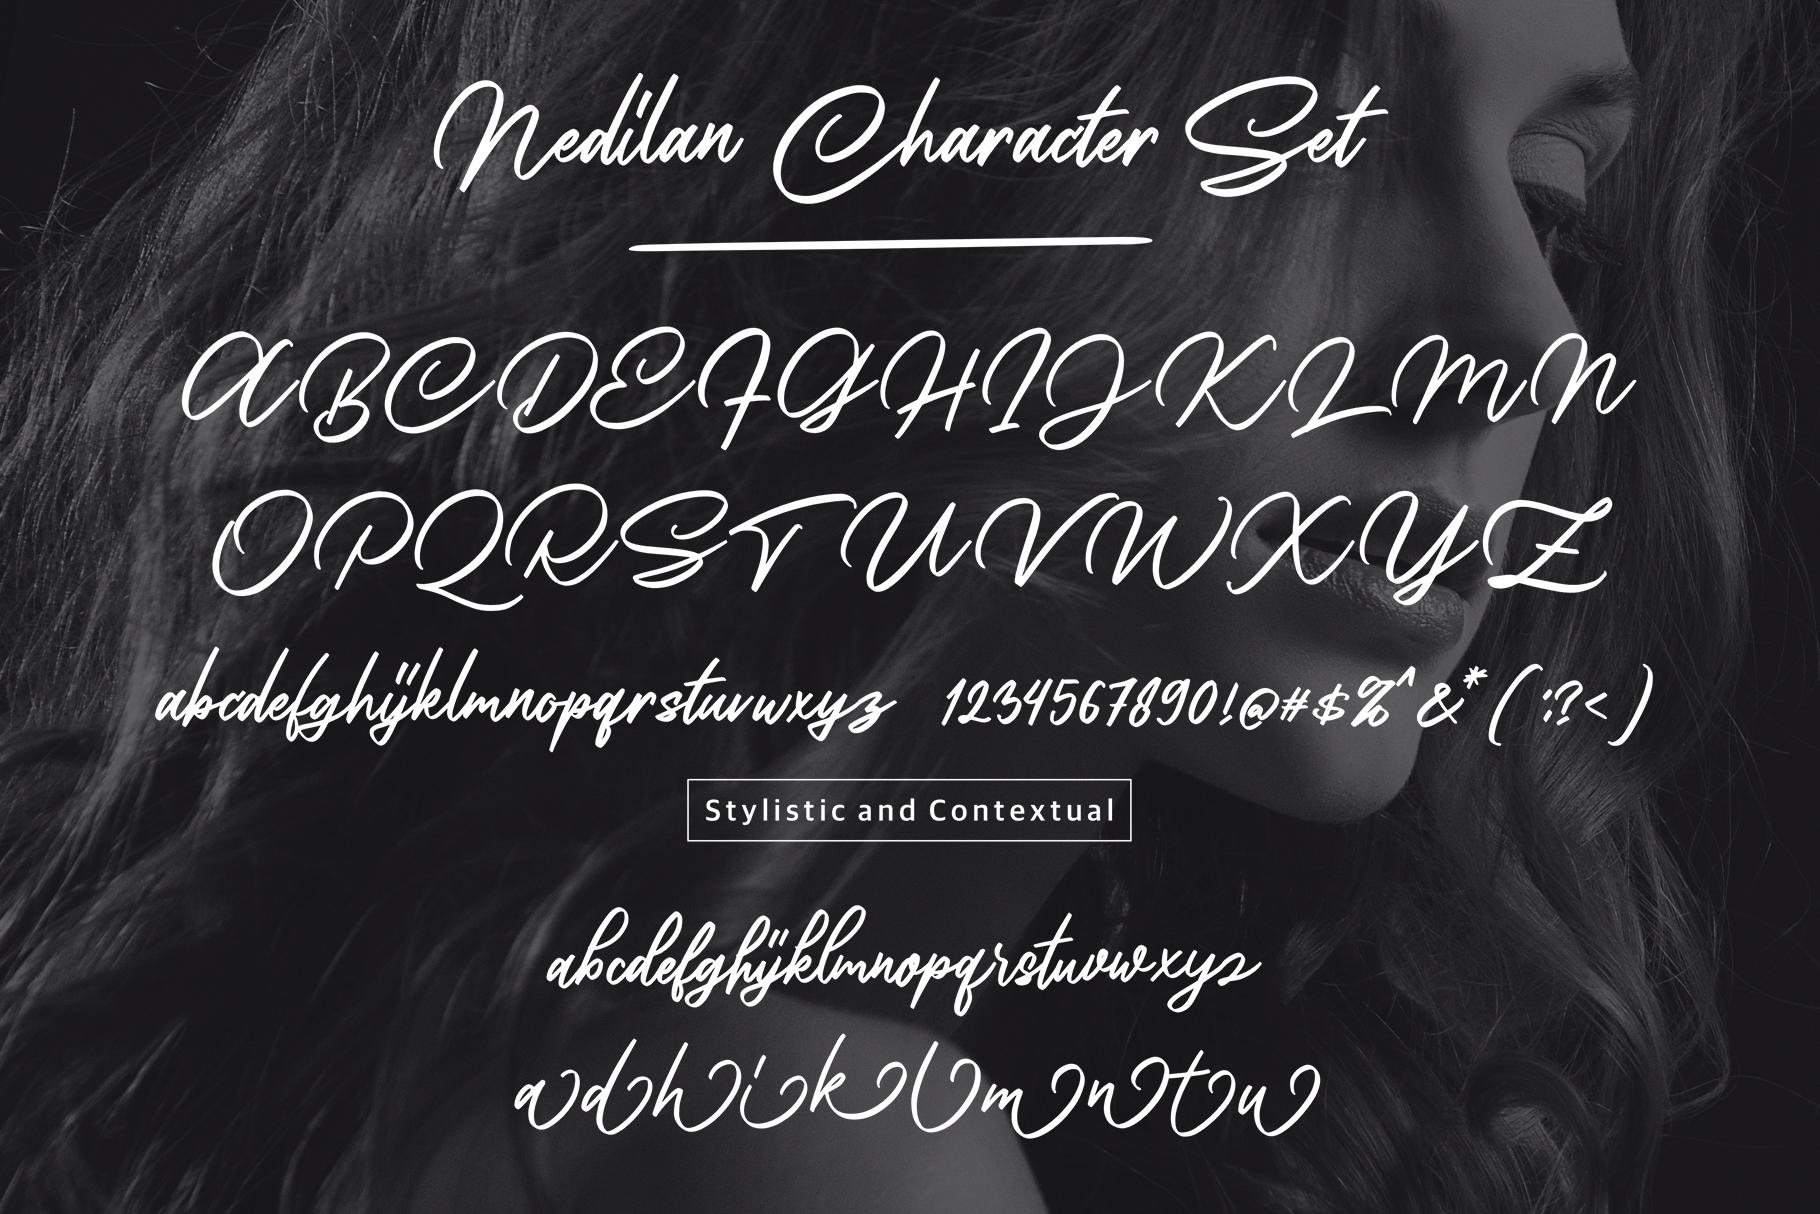 Nedilan - Signature Nedilan - Signature by BRTL in Fonts De example image 8